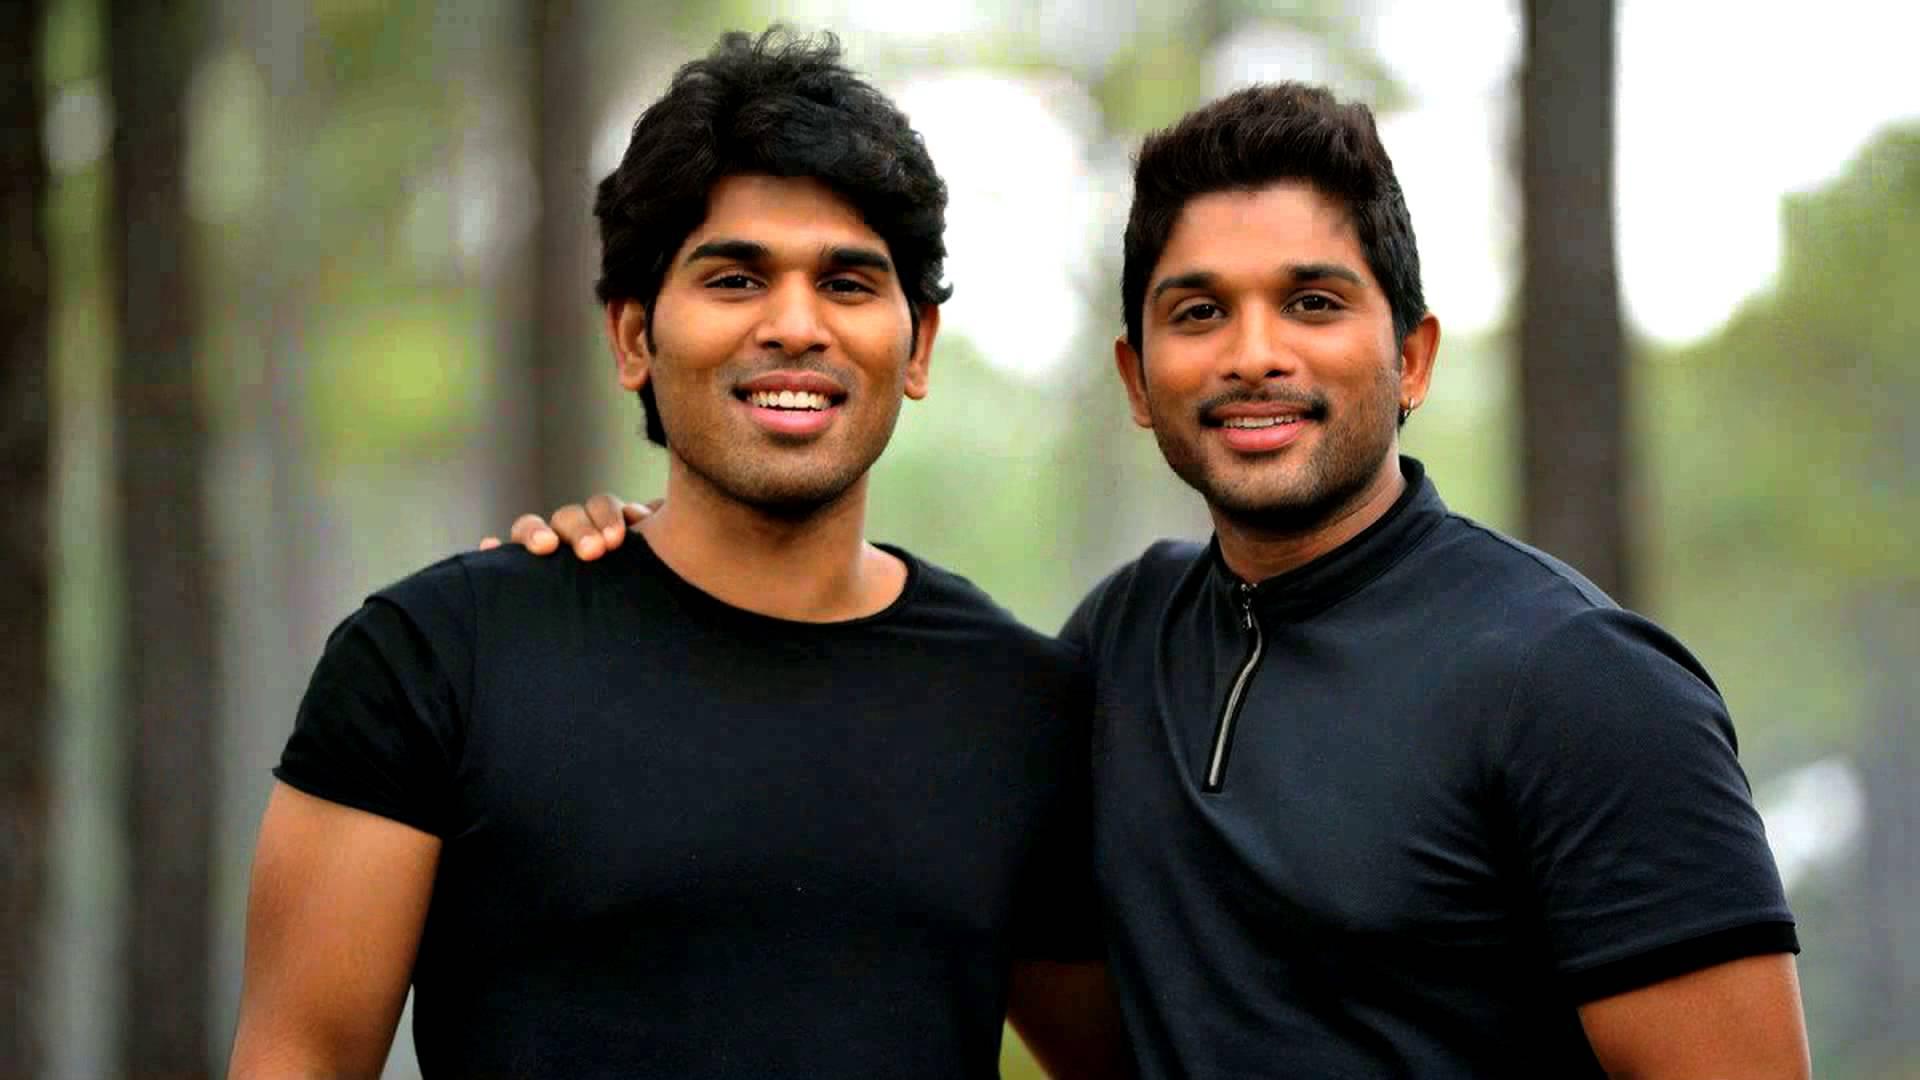 Allu Arjun S Career Advice To His Brother 25cineframes